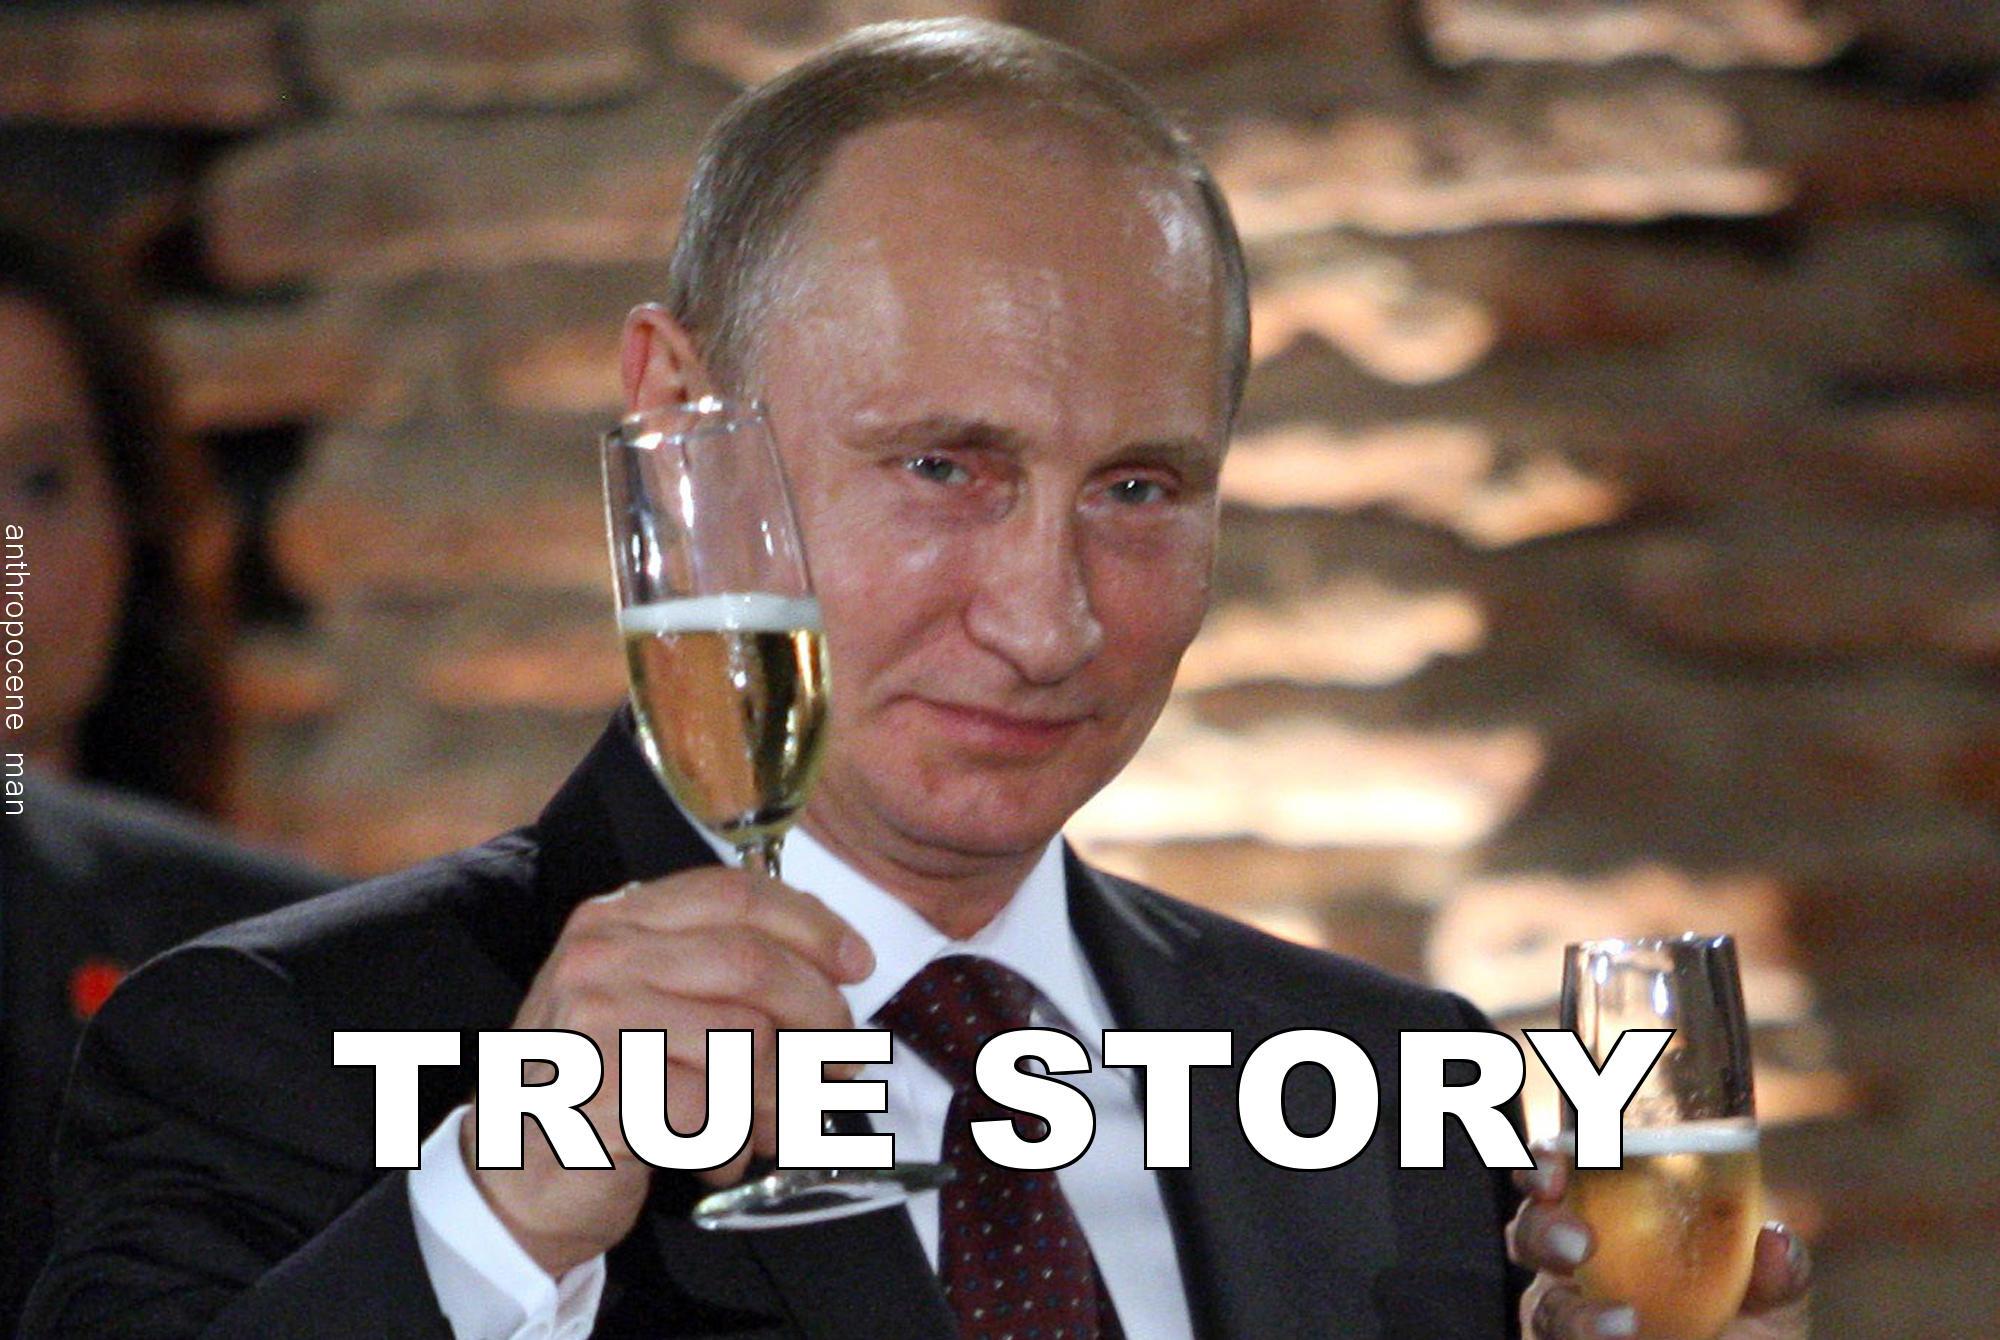 653 true story russian anti meme law know your meme,Meme Law